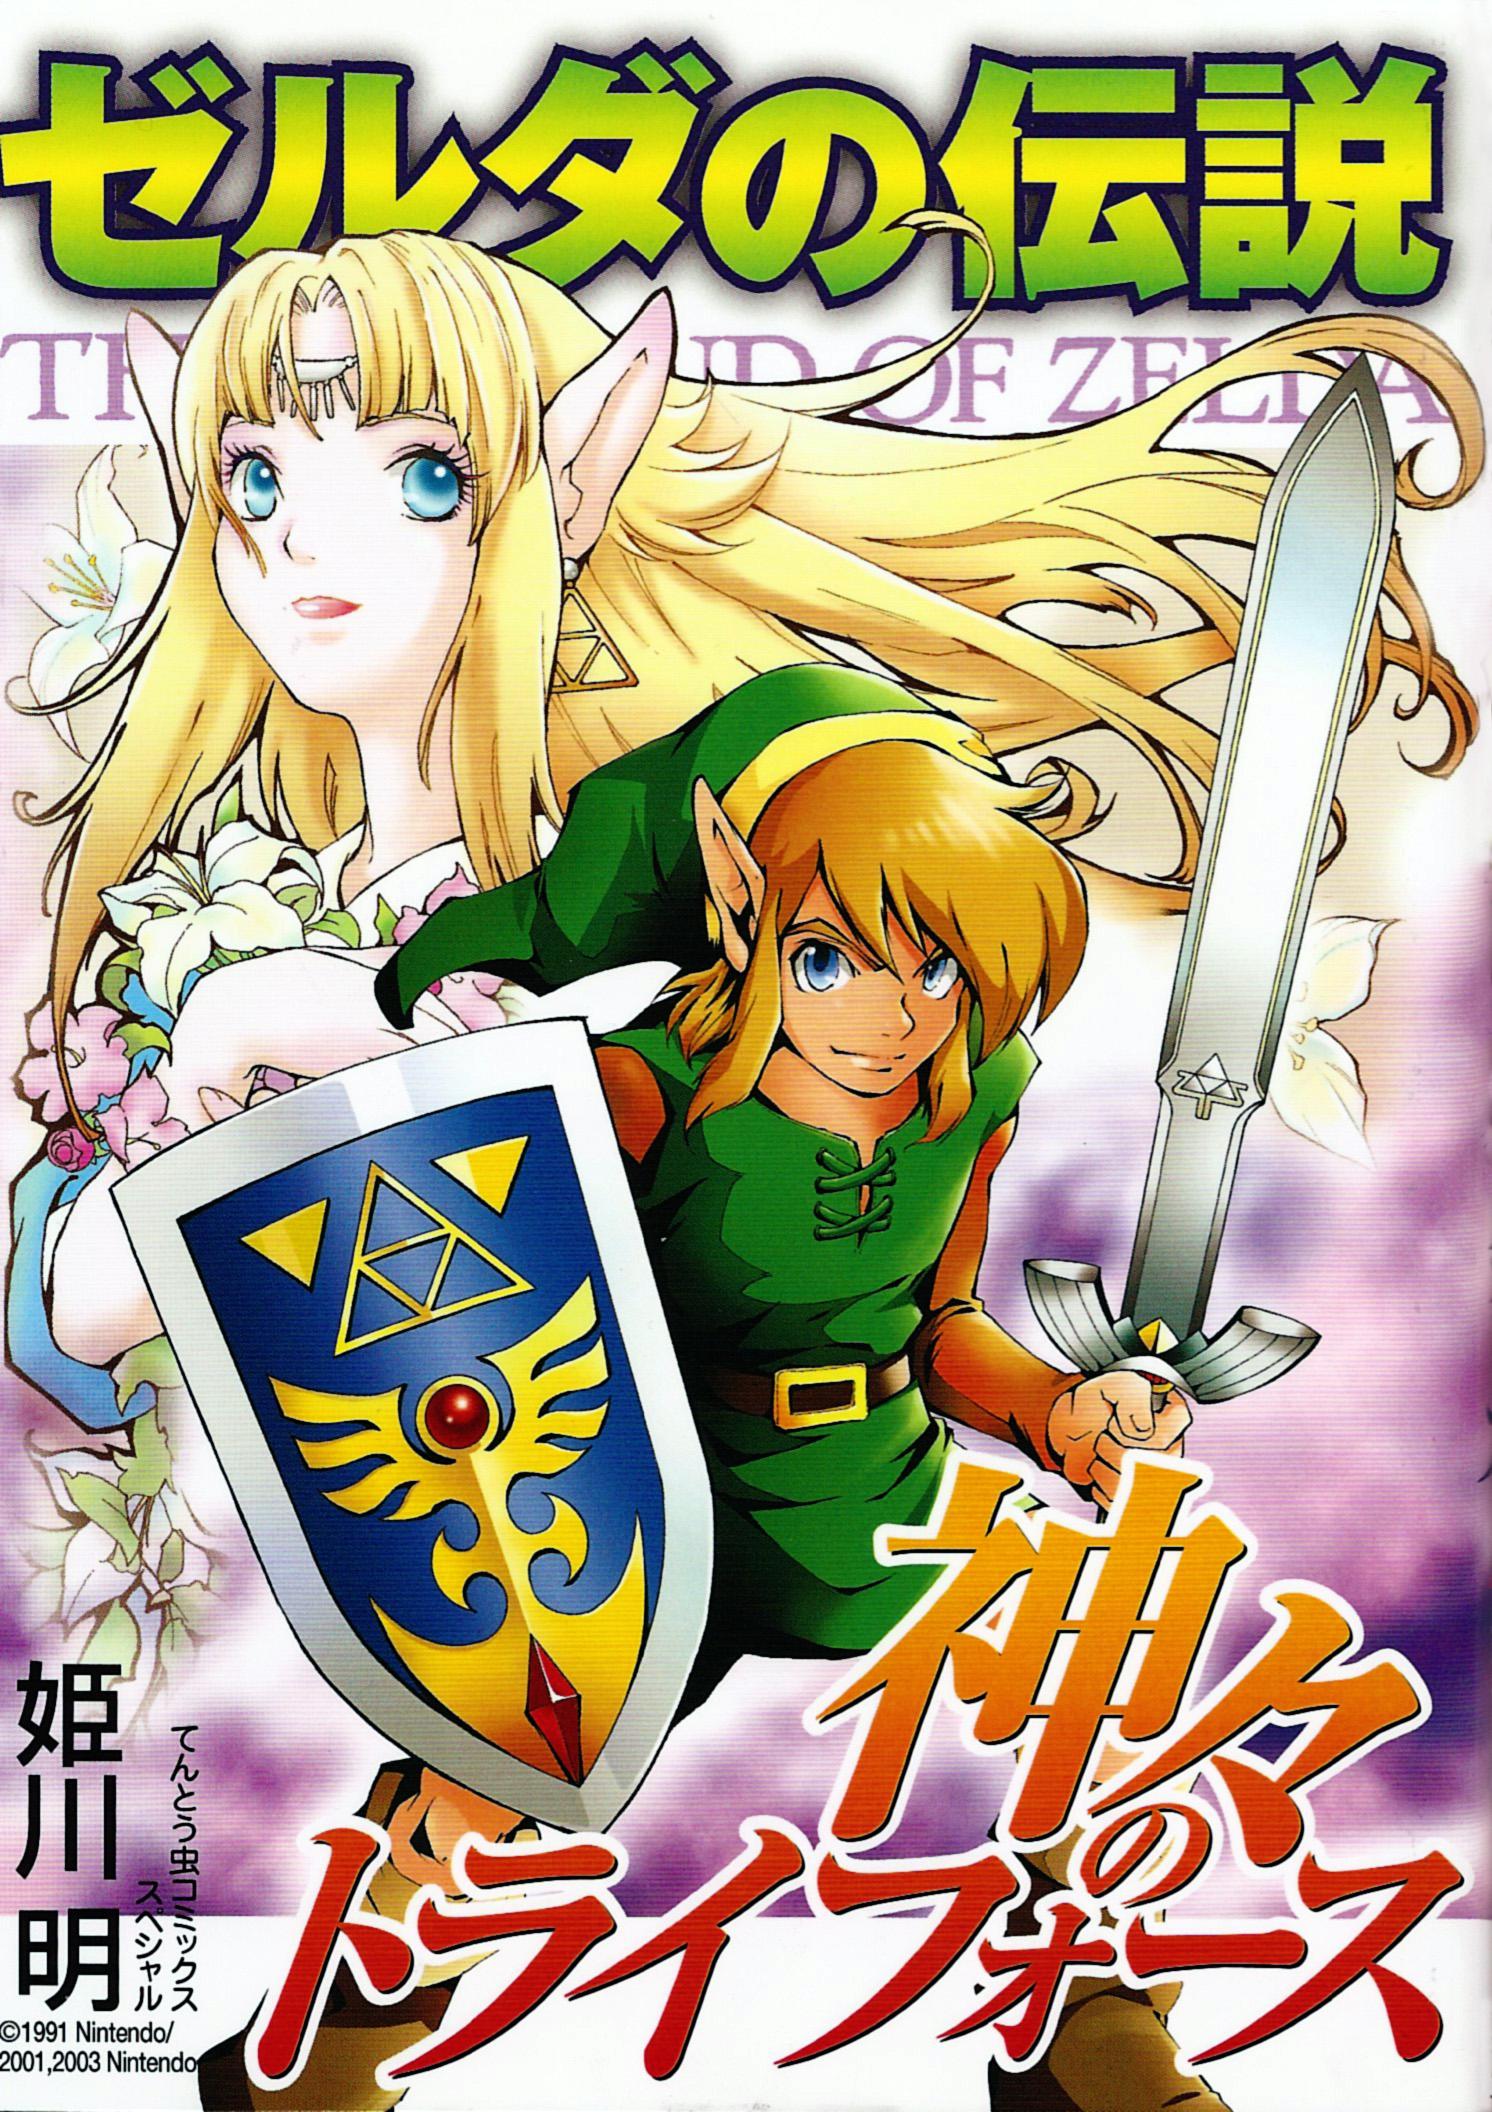 Zelda no Densetsu Kamigami no Triforce The Legend Of Zelda Link